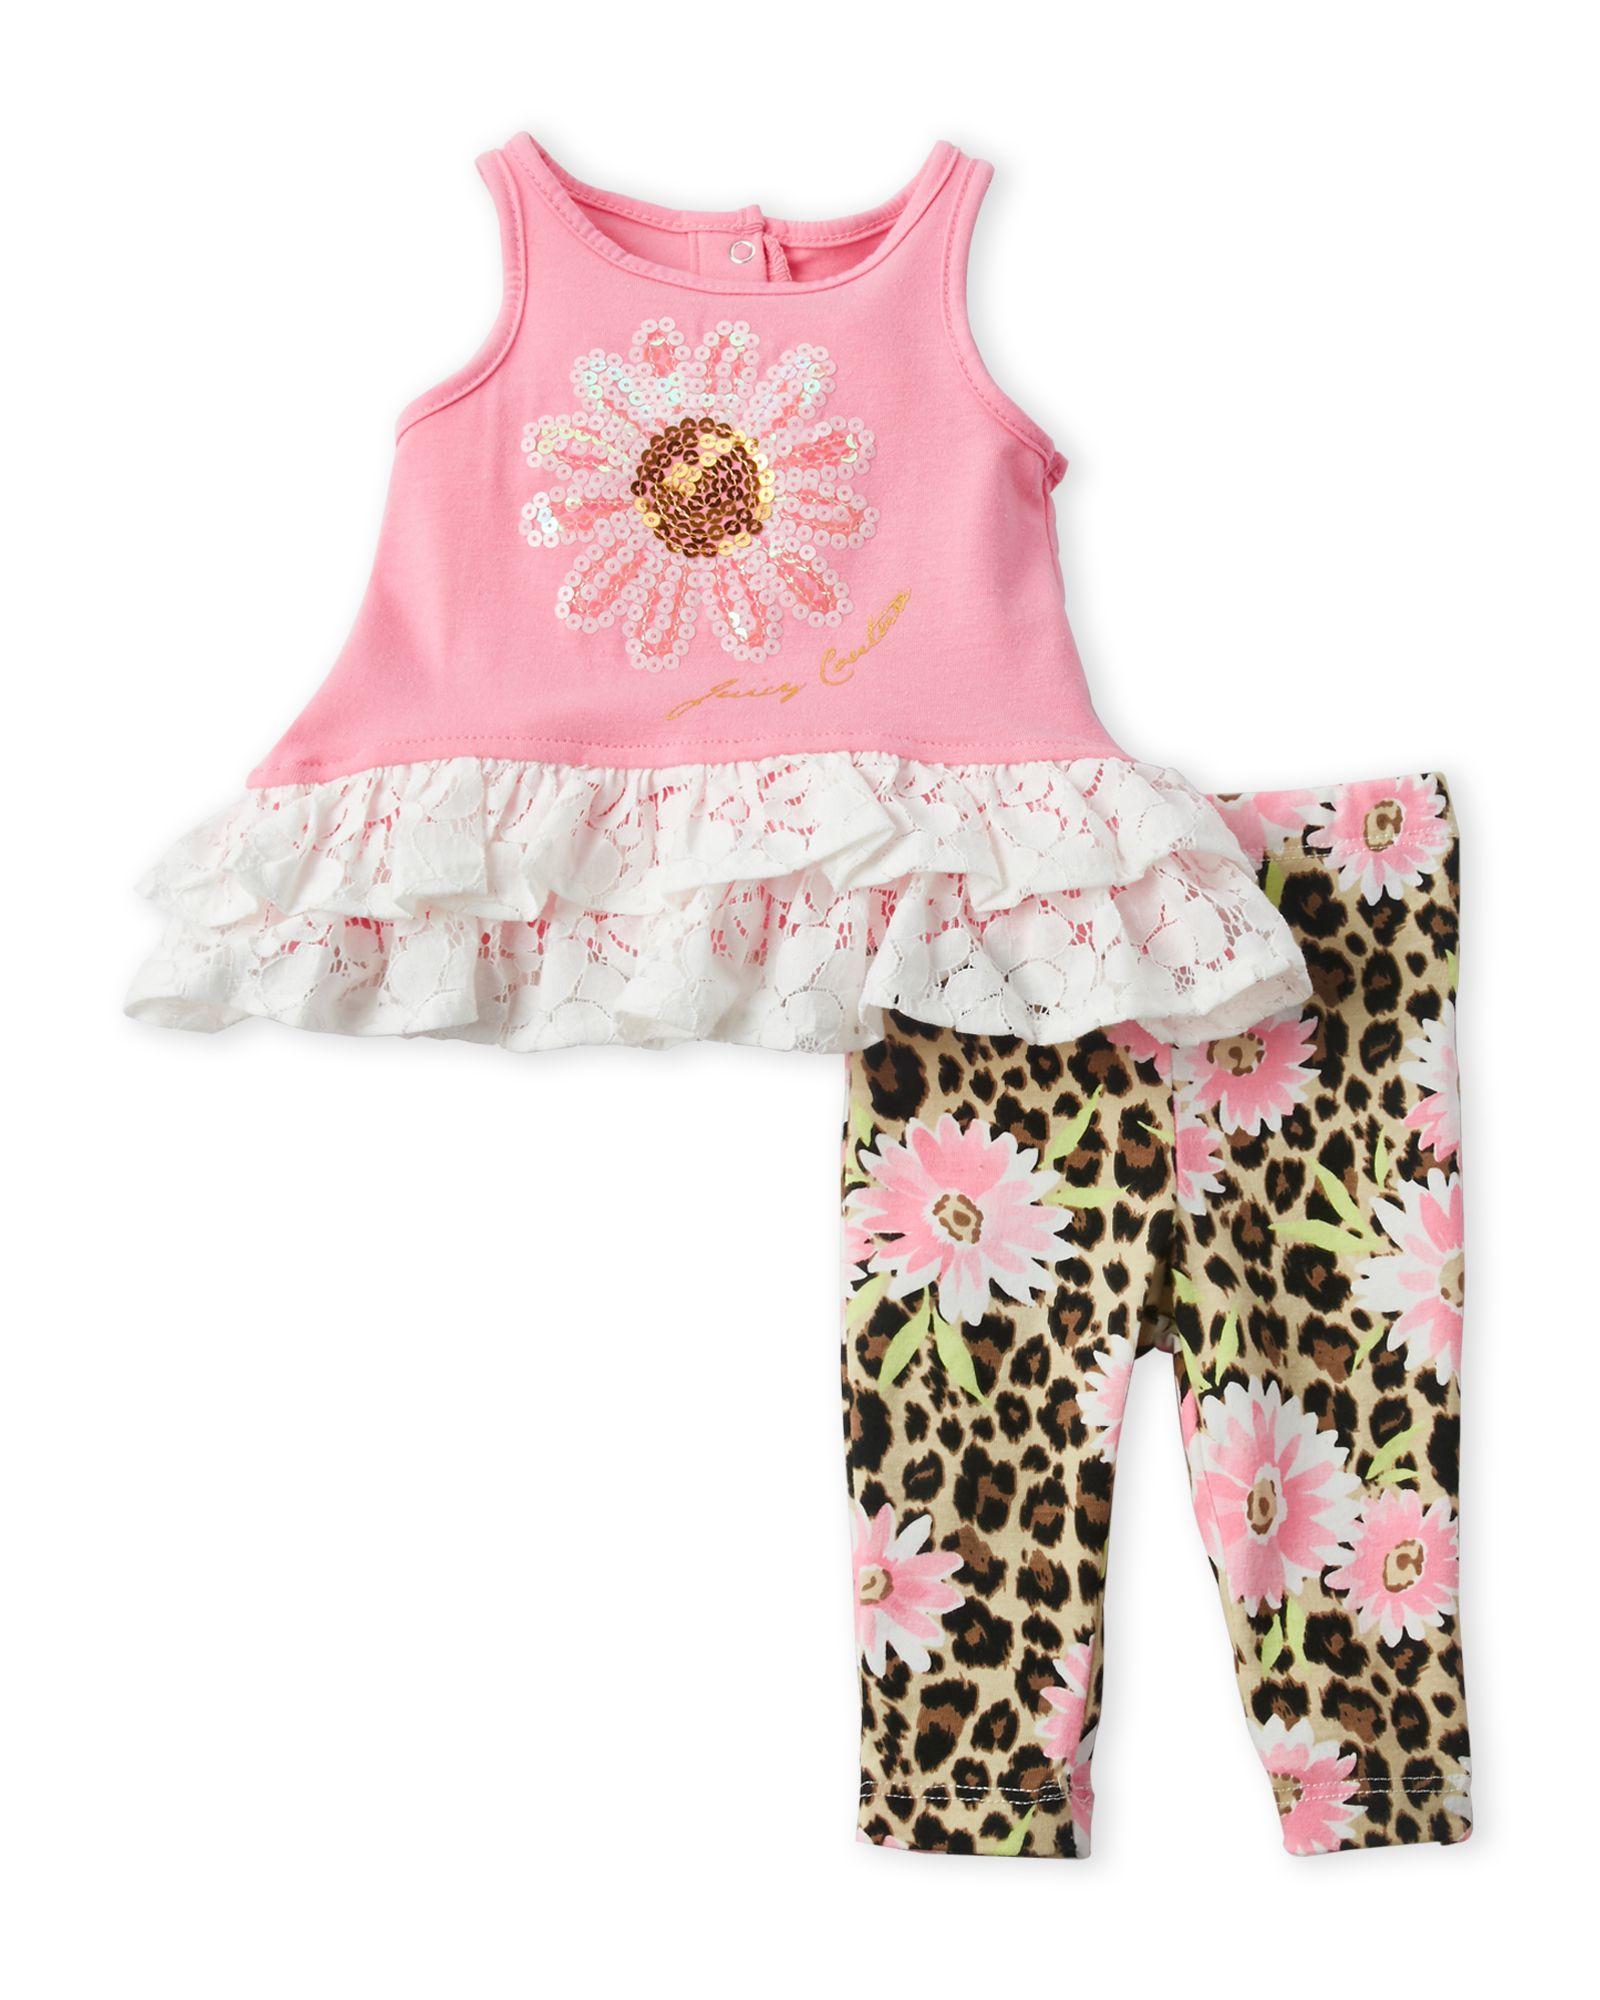 Juicy Couture (Newborn Girls) Sequin Flower Tunic & Printed Leggings Set